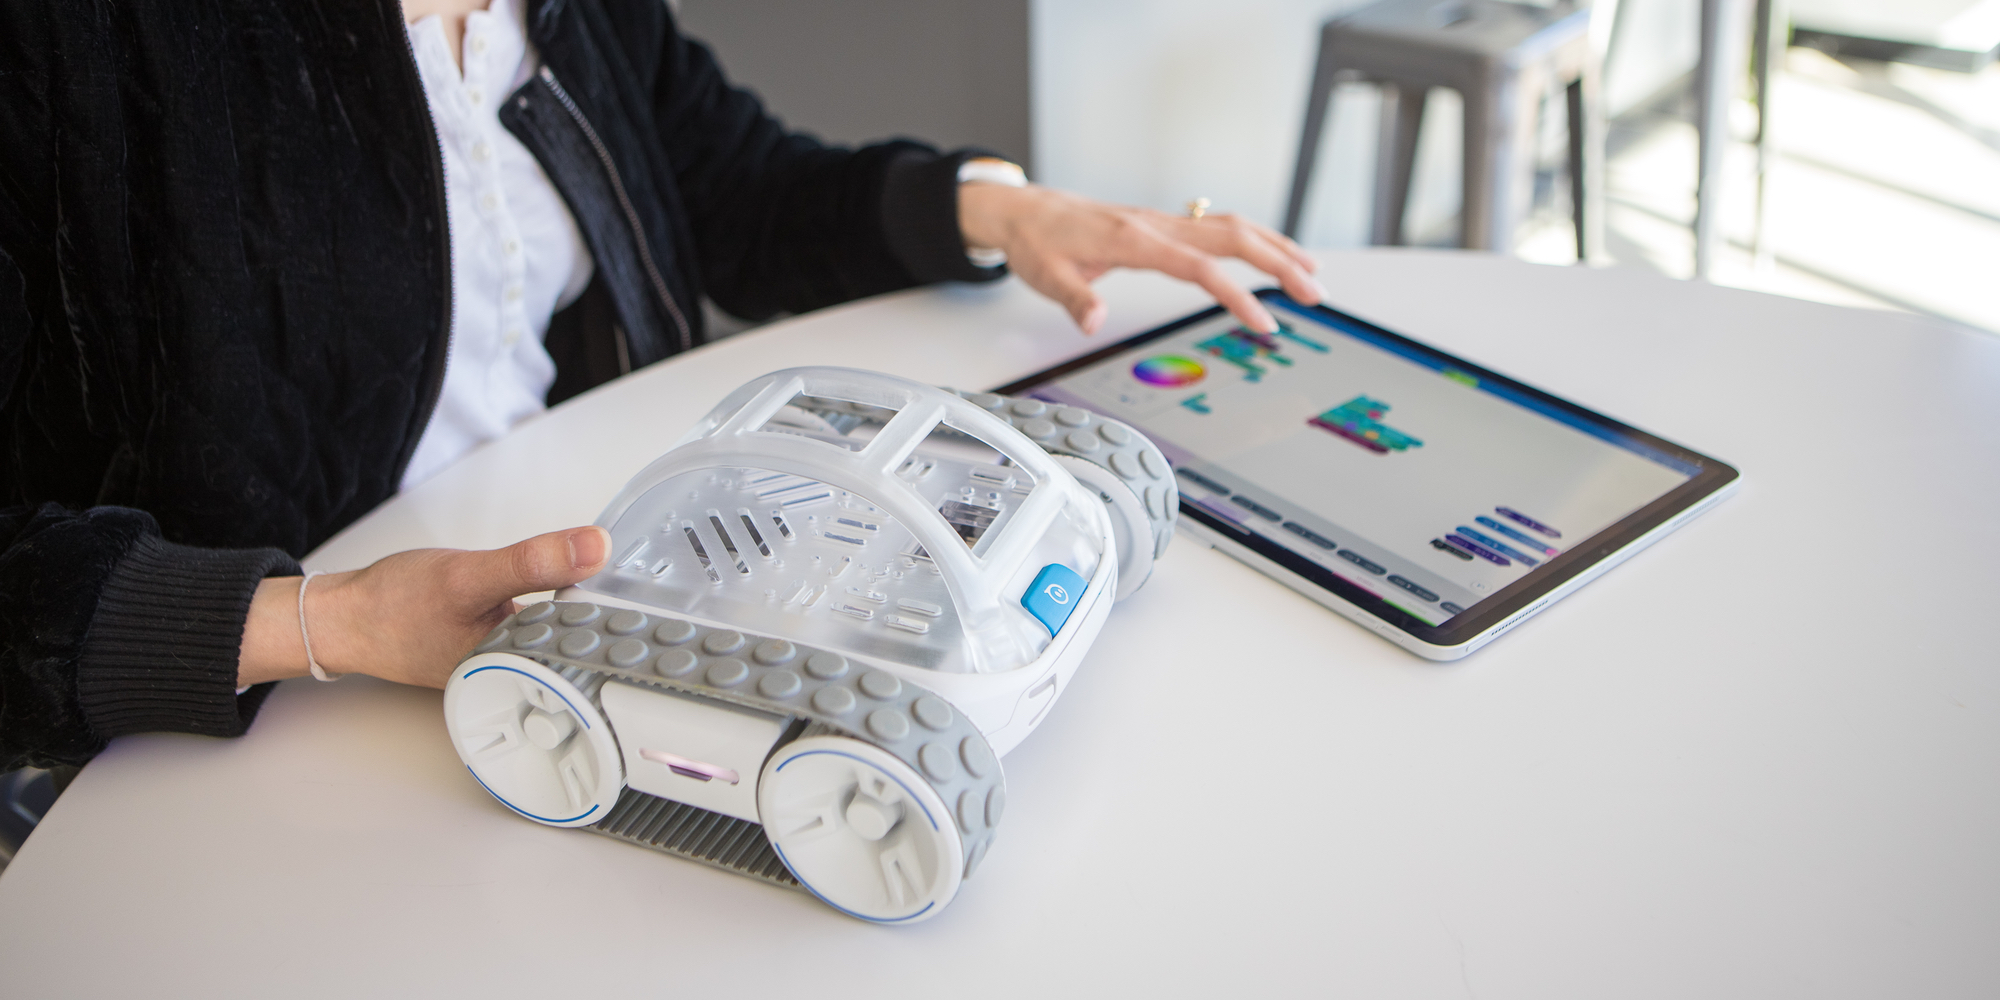 Sphero RVR iPad compatibility